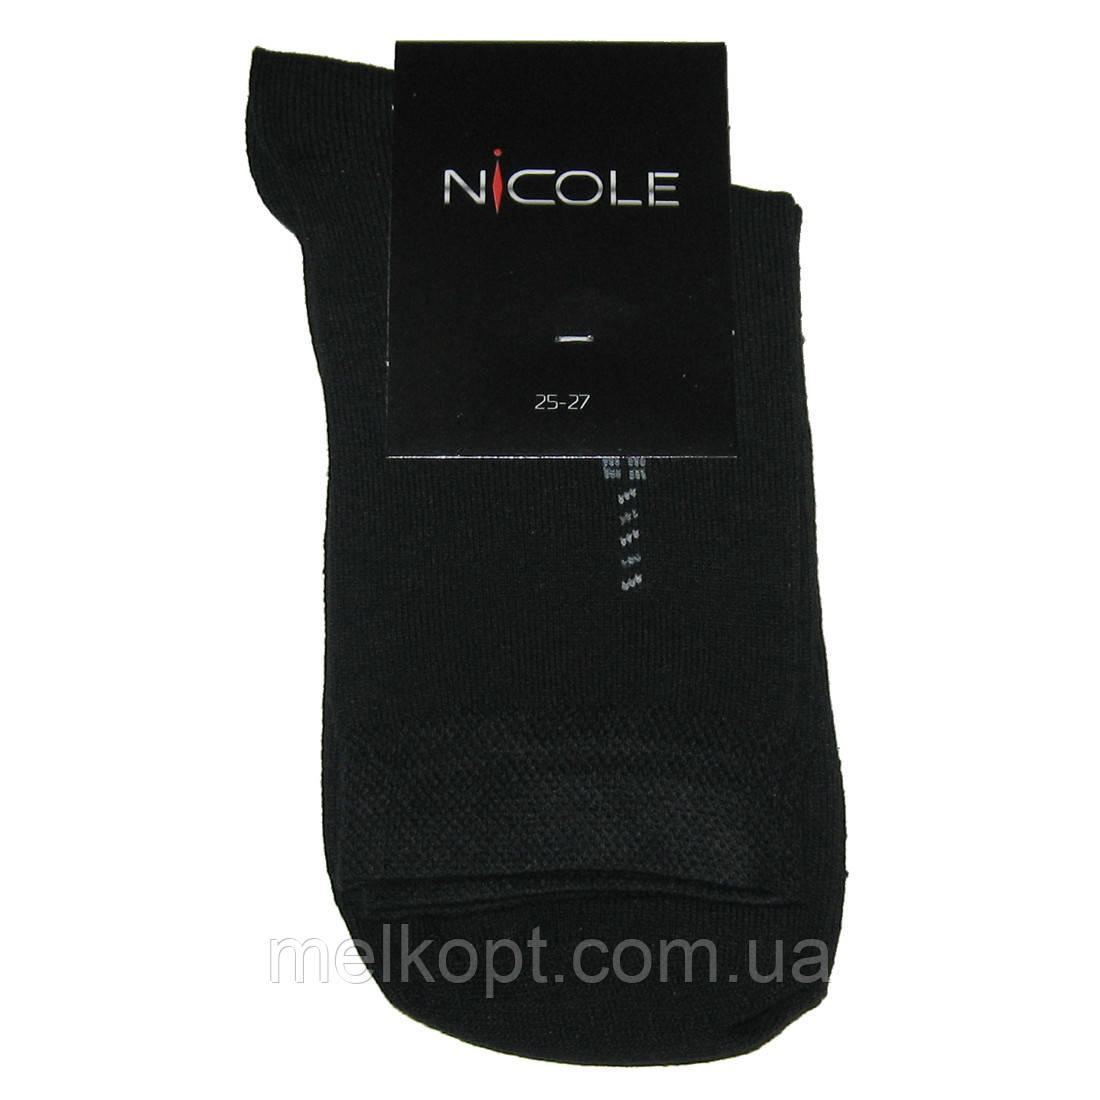 Мужские носки Nicole - 9,25 грн./пара (стрейч)